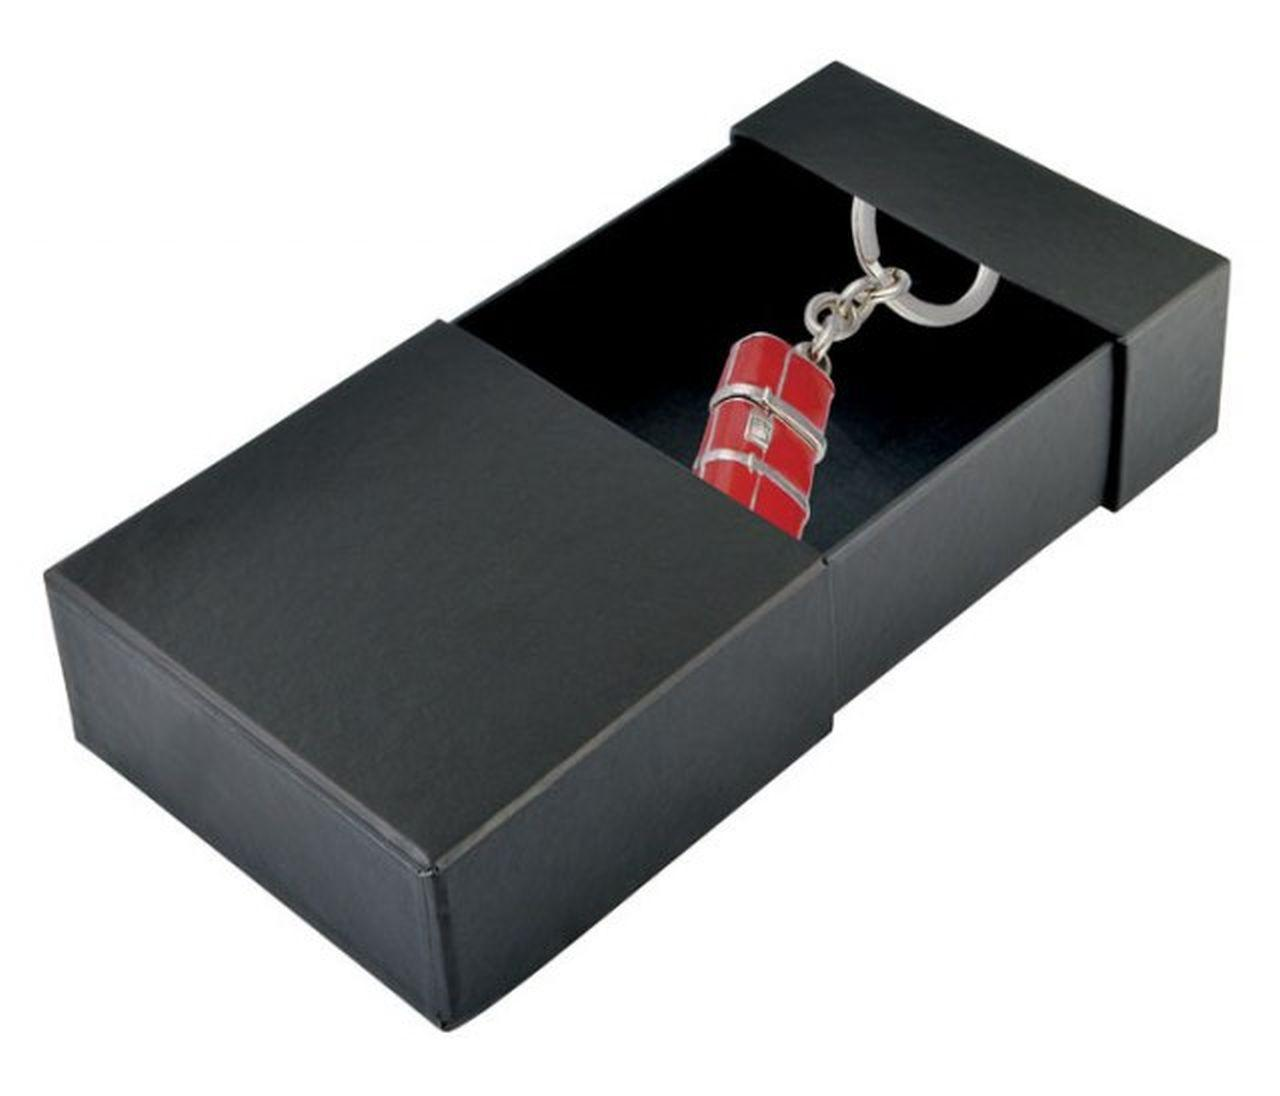 scatola nera grande cm.10x8x3,5h